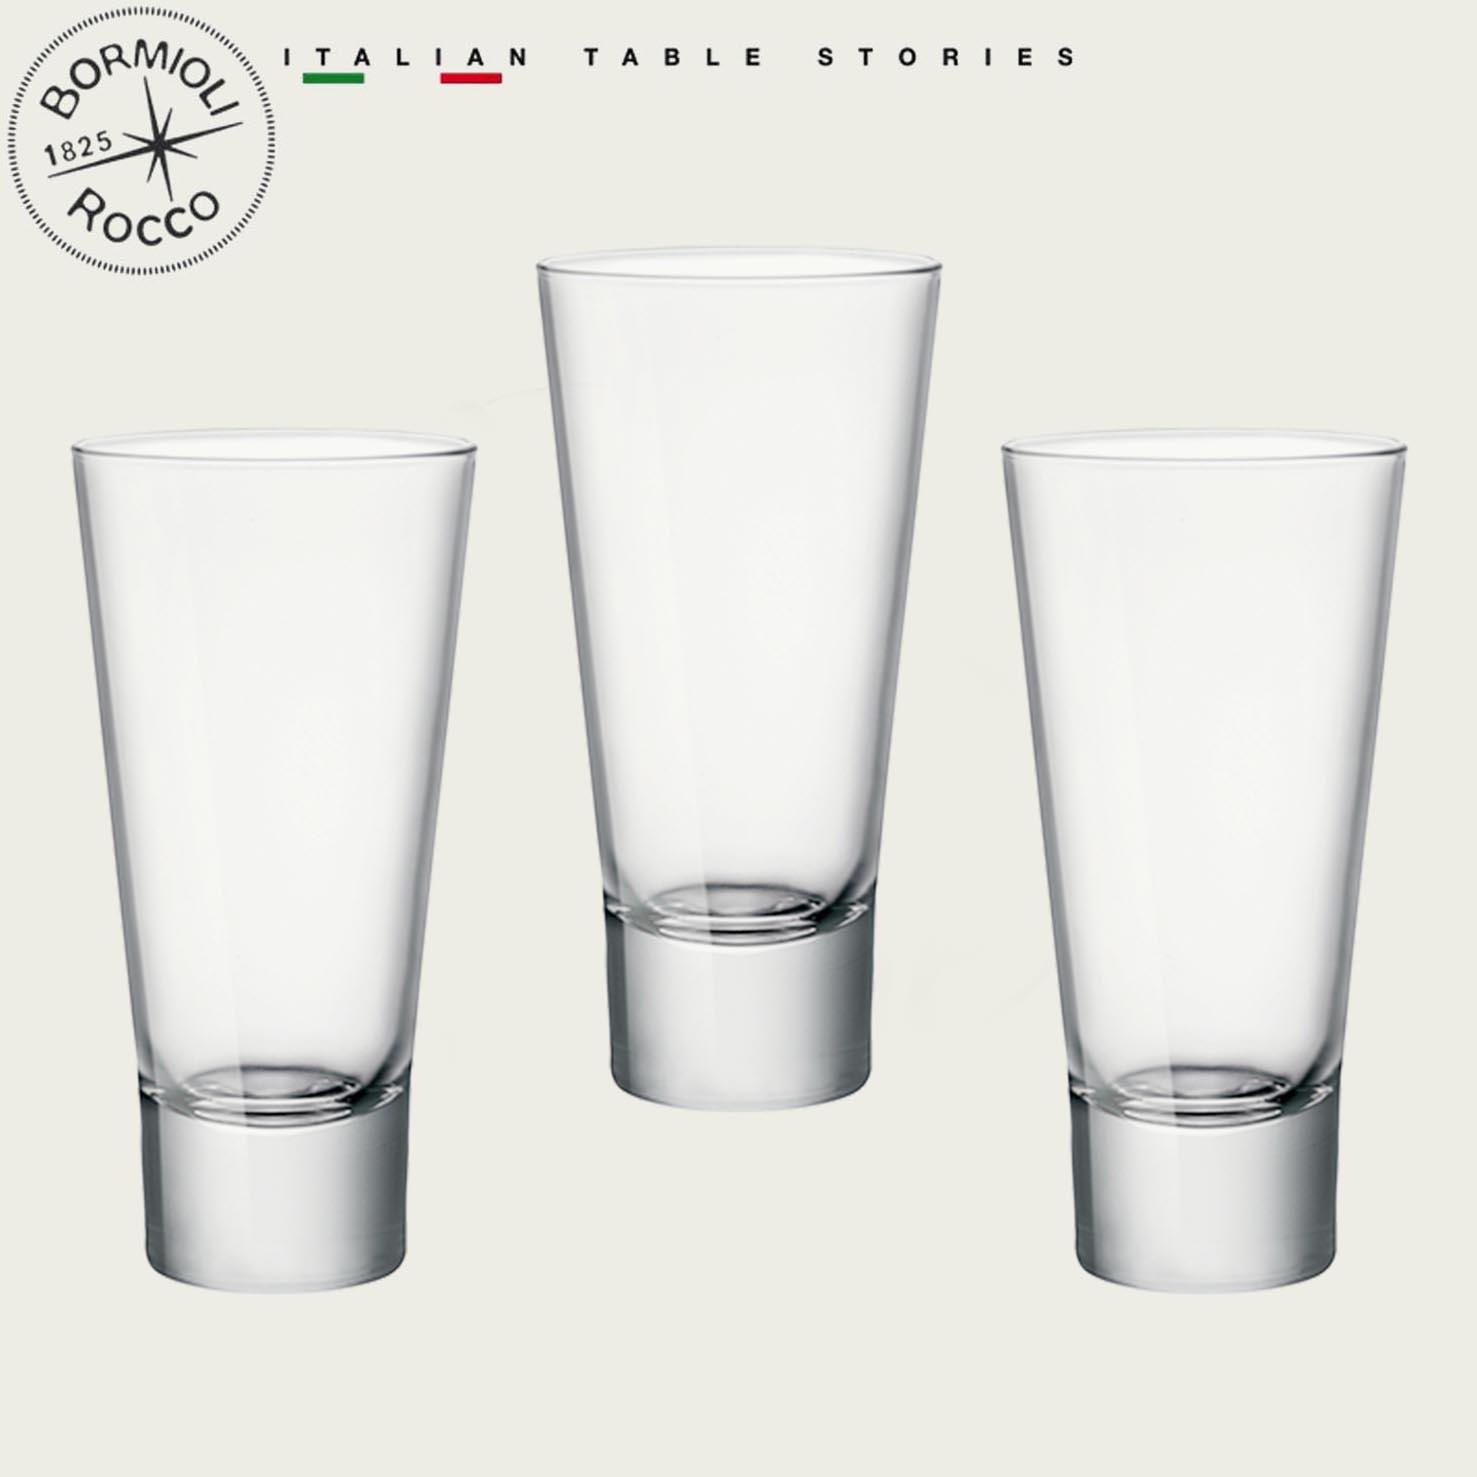 BORMIOLI SET 3 BICCHIERI YPSILON LONG DRINK 24CL